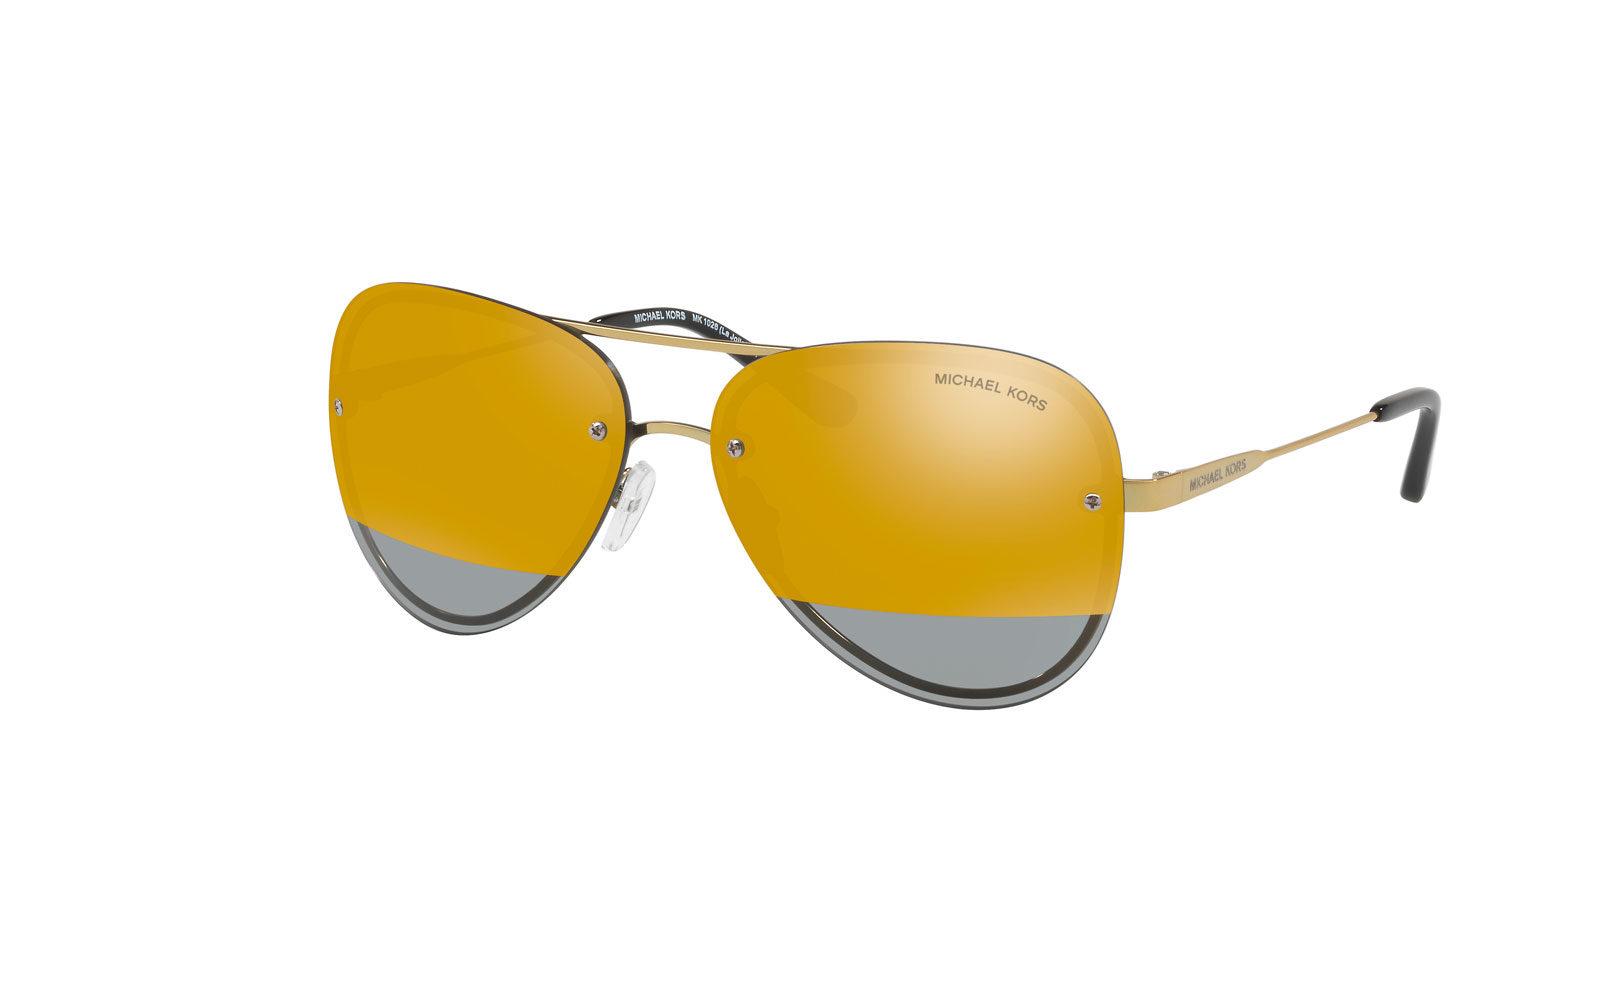 MICHAEL KORS occhiali avietor con lenti specchiate. 245 euro     www.michaelkors.it